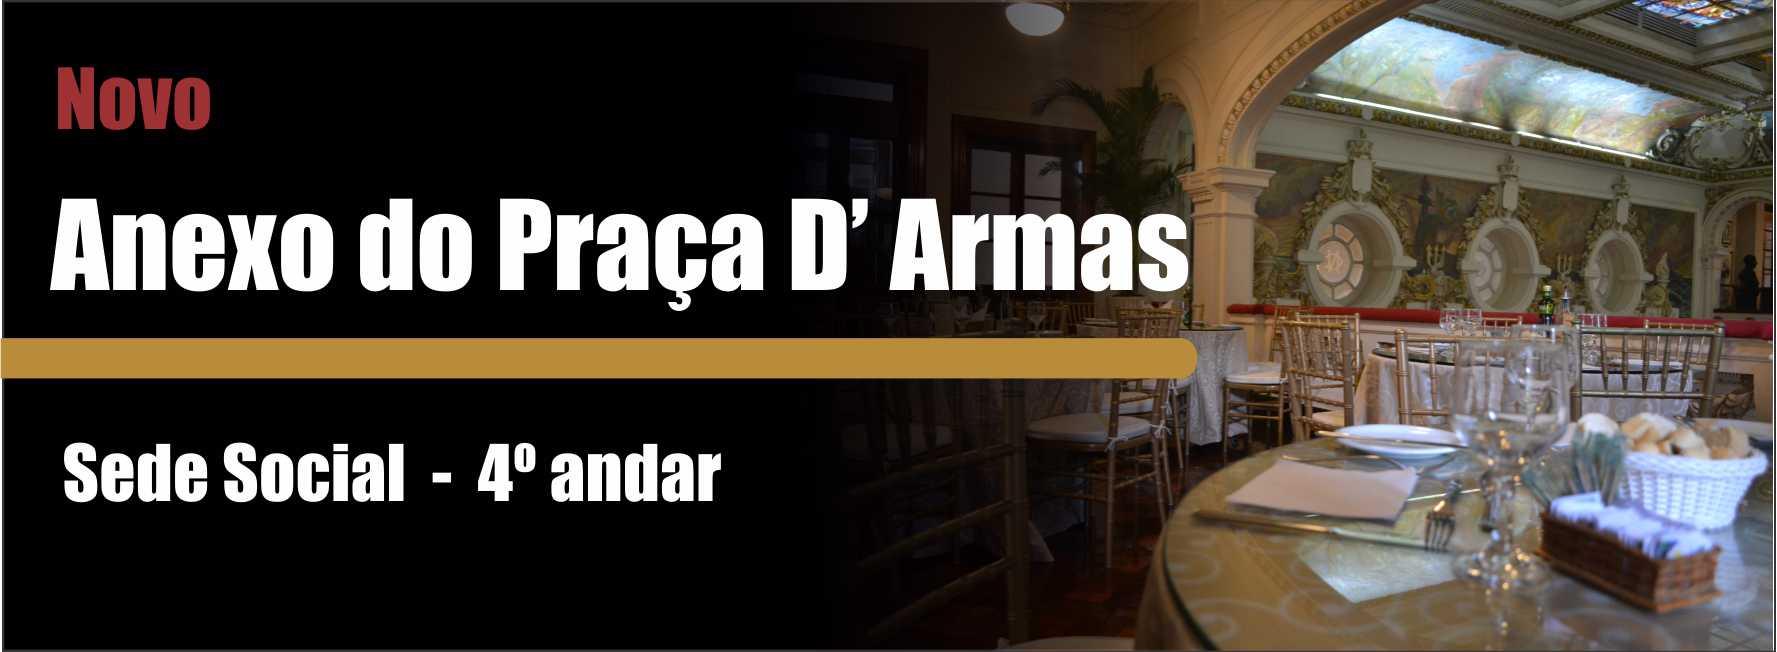 https://www.clubenaval.org.br/novo/novo-anexo-do-pra%C3%A7a-darmas